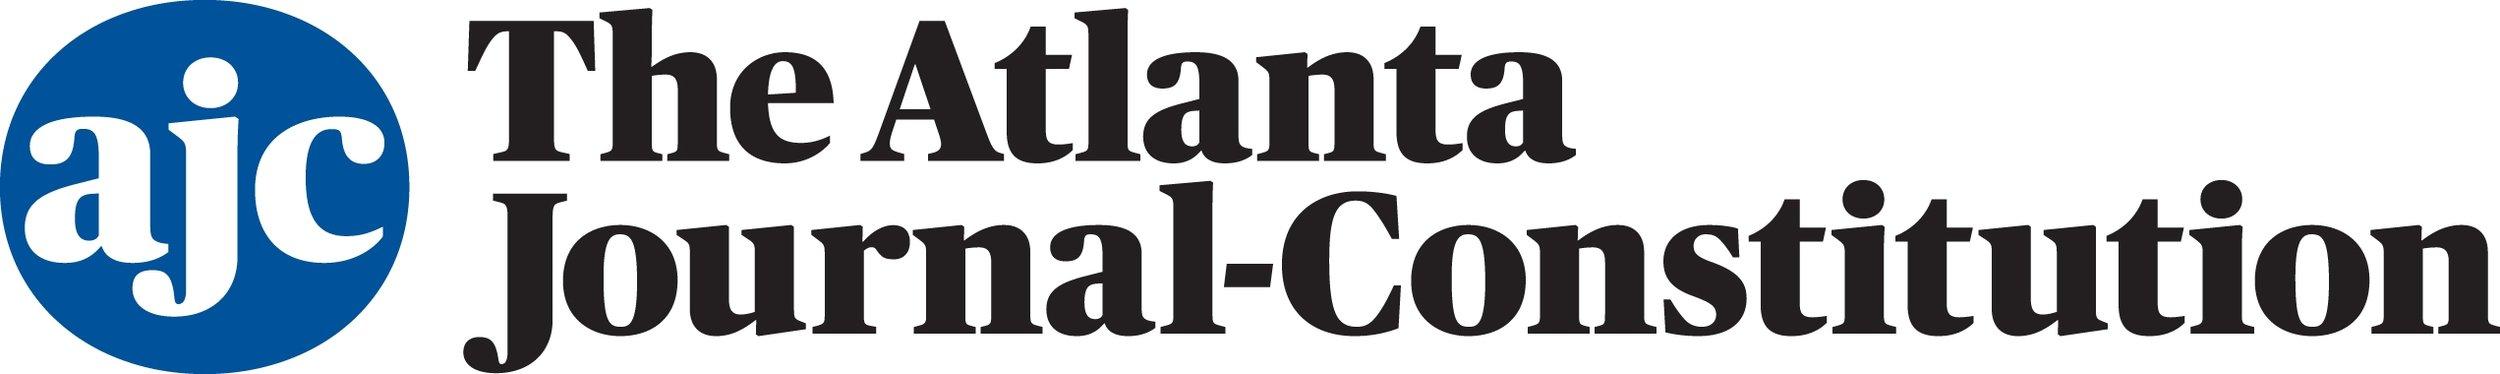 Atlanta-Journal-Constitution.jpg